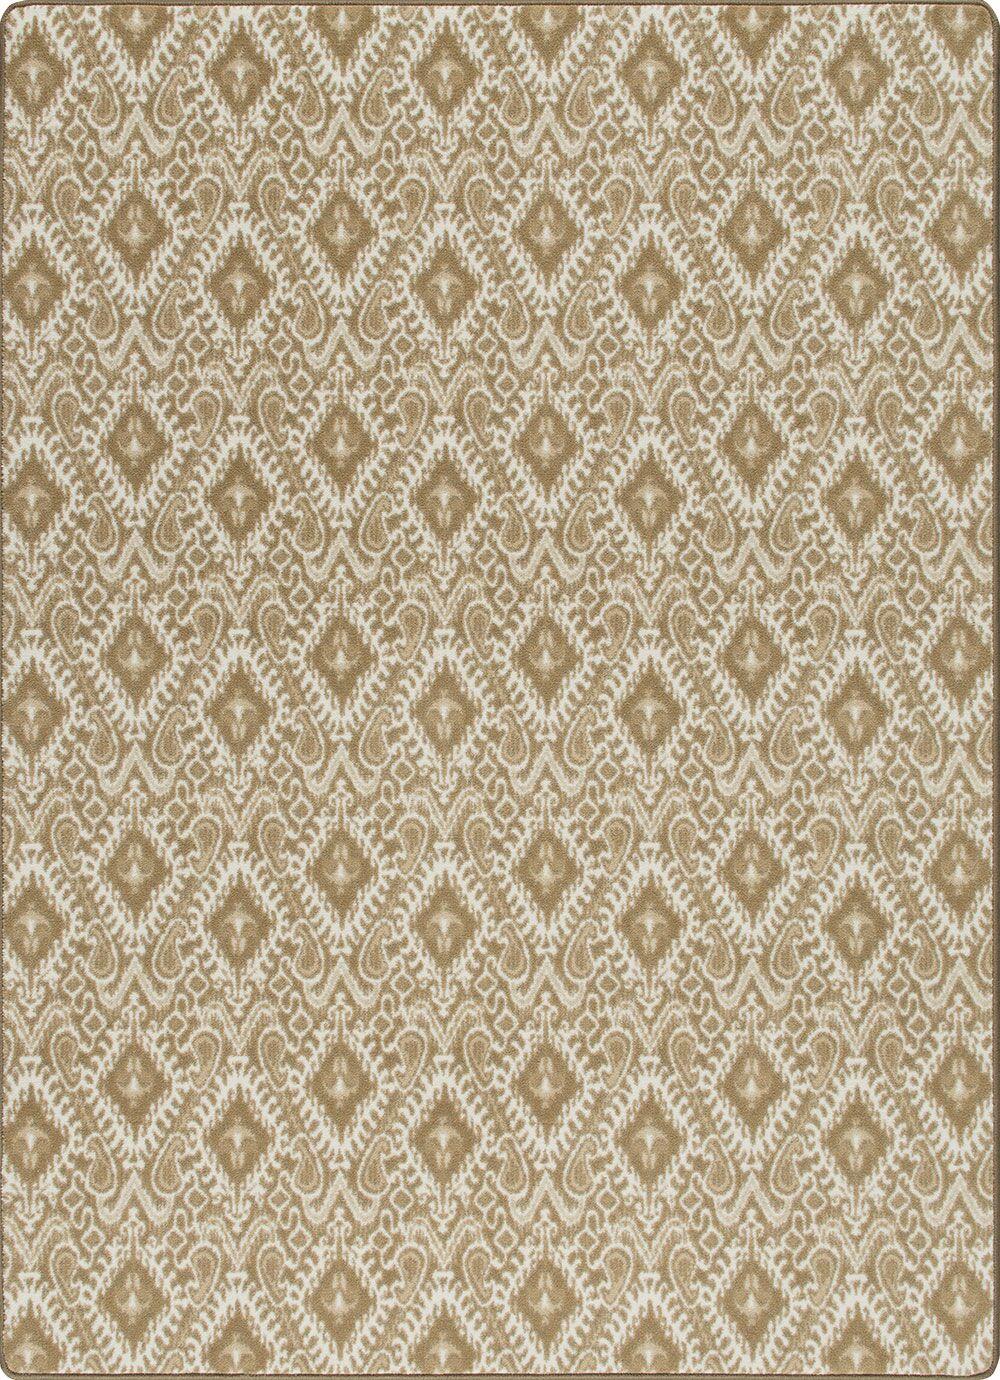 Glastonbury Crafted Sepia Area Rug Rug Size: Rectangle 5'3